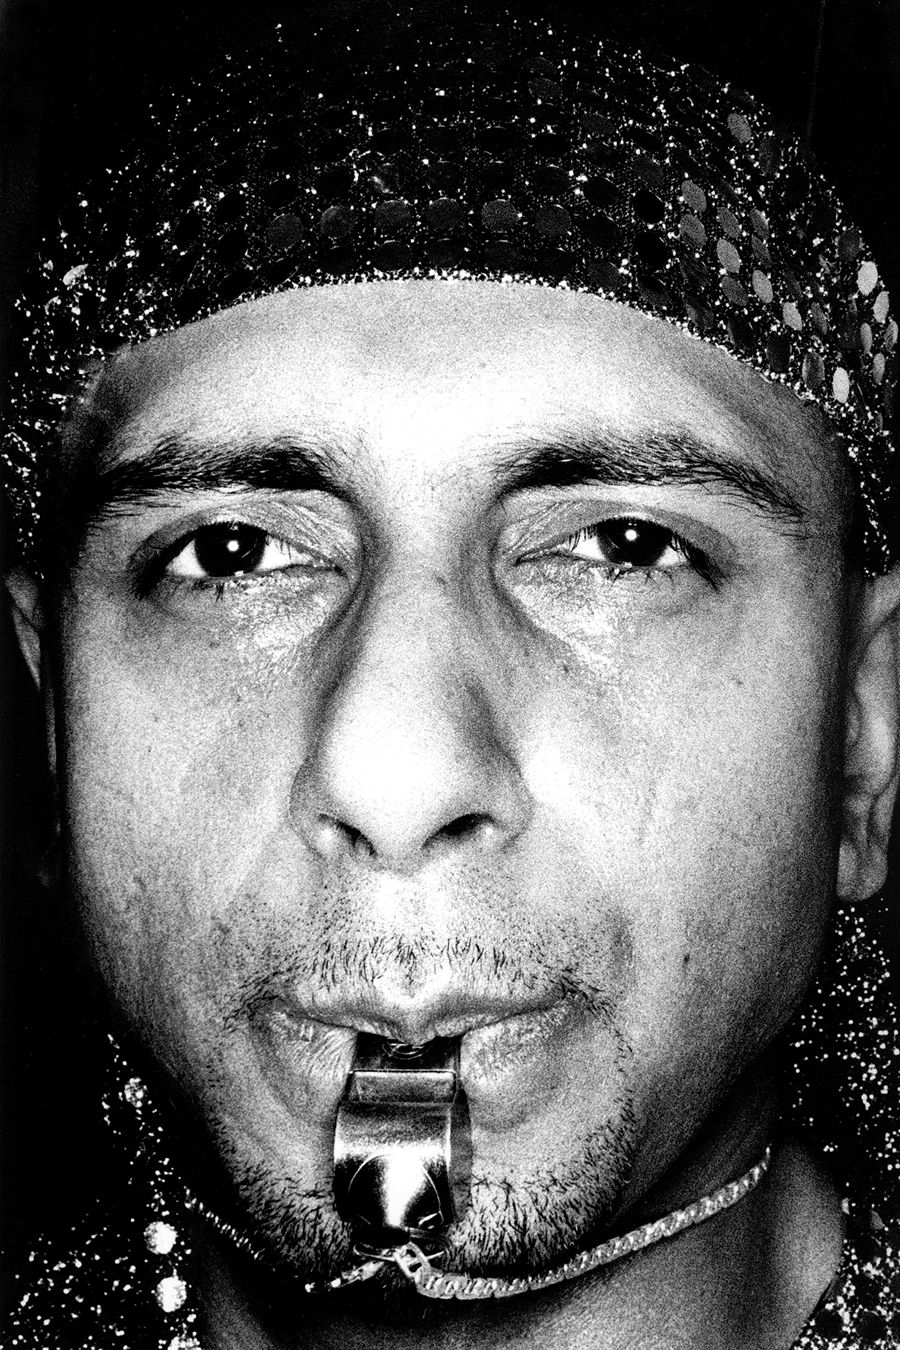 med-Tony_Ward_photography_Wasteland_party_amsterdam_man_whistle_portrait_